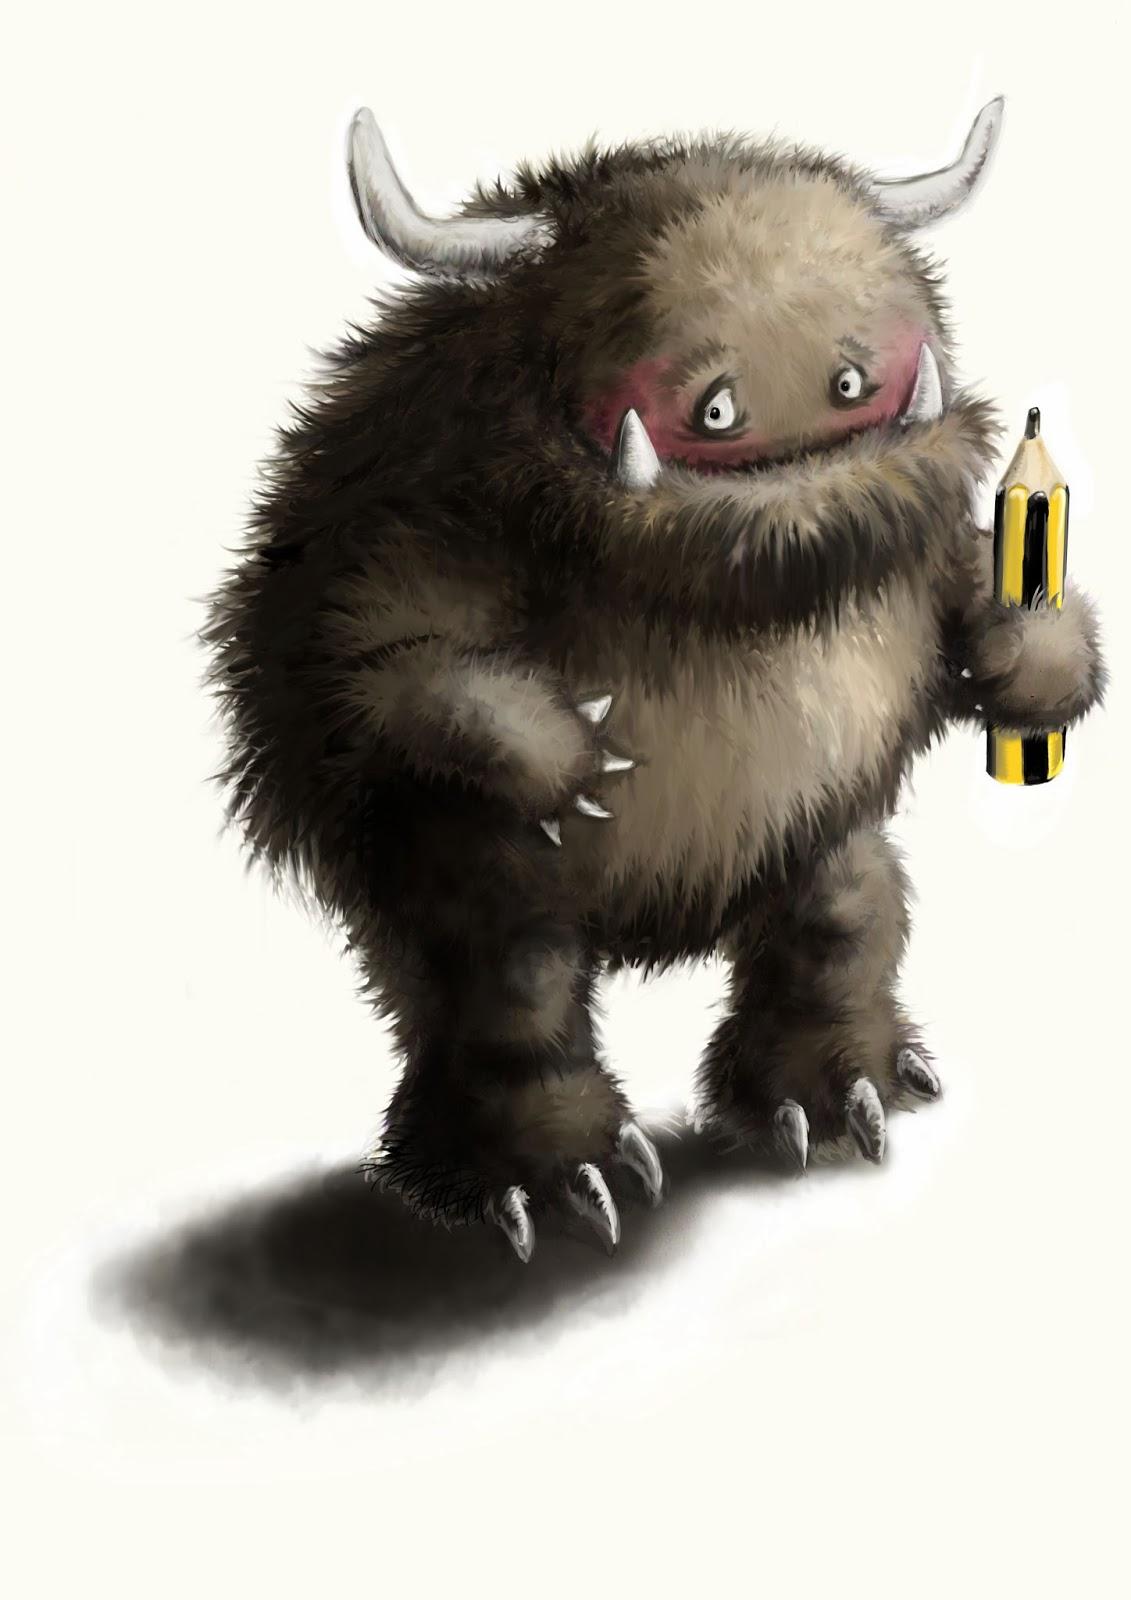 Kinderbuchillustration, Monster, Fehlerteufel, children's book illustration, cute, gremlin